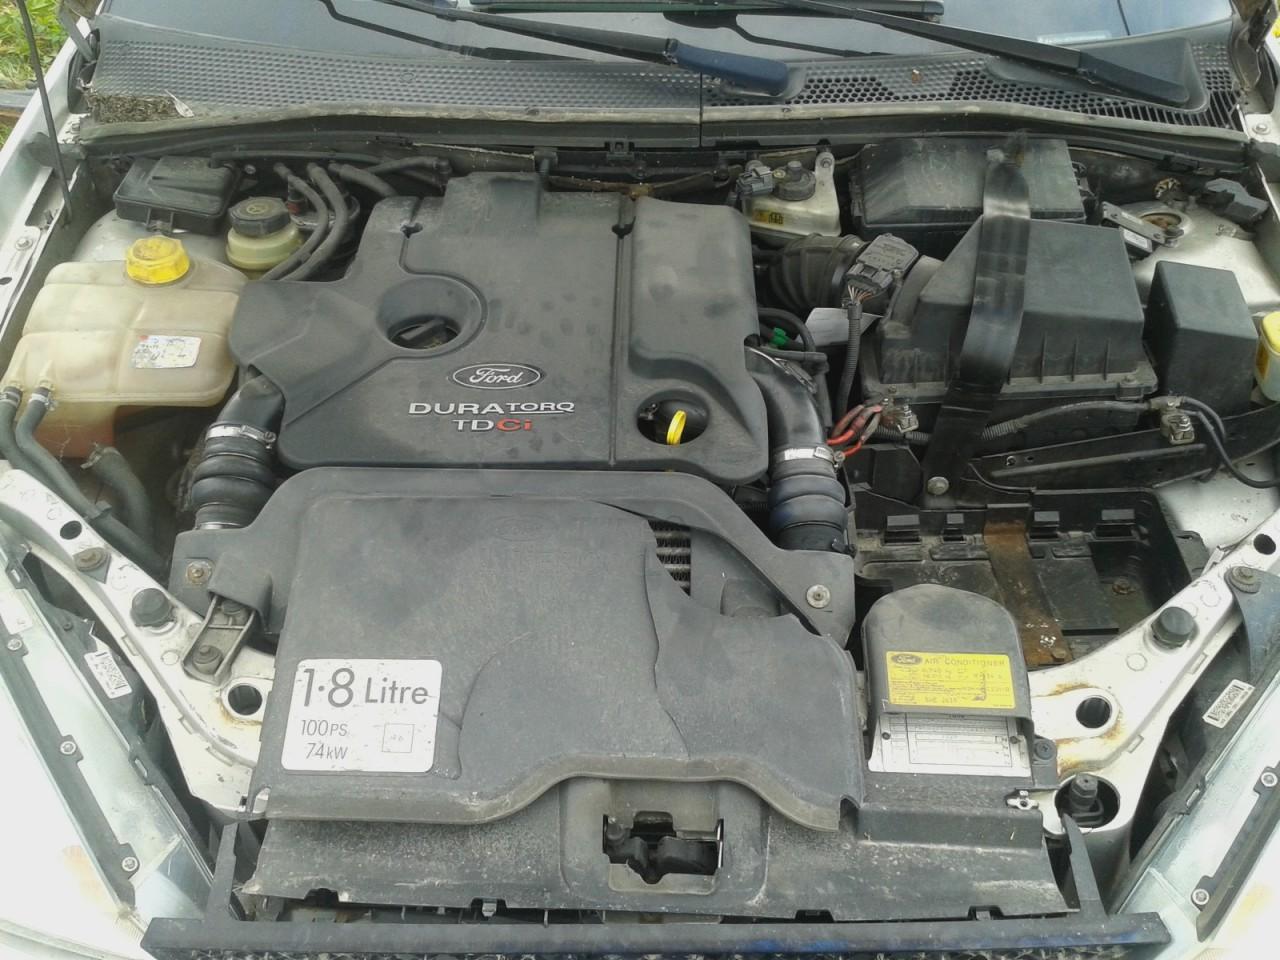 dezmembrez ford focus1  1.8 tdci 85kw 115cp 2003 1998-2003 limuzina